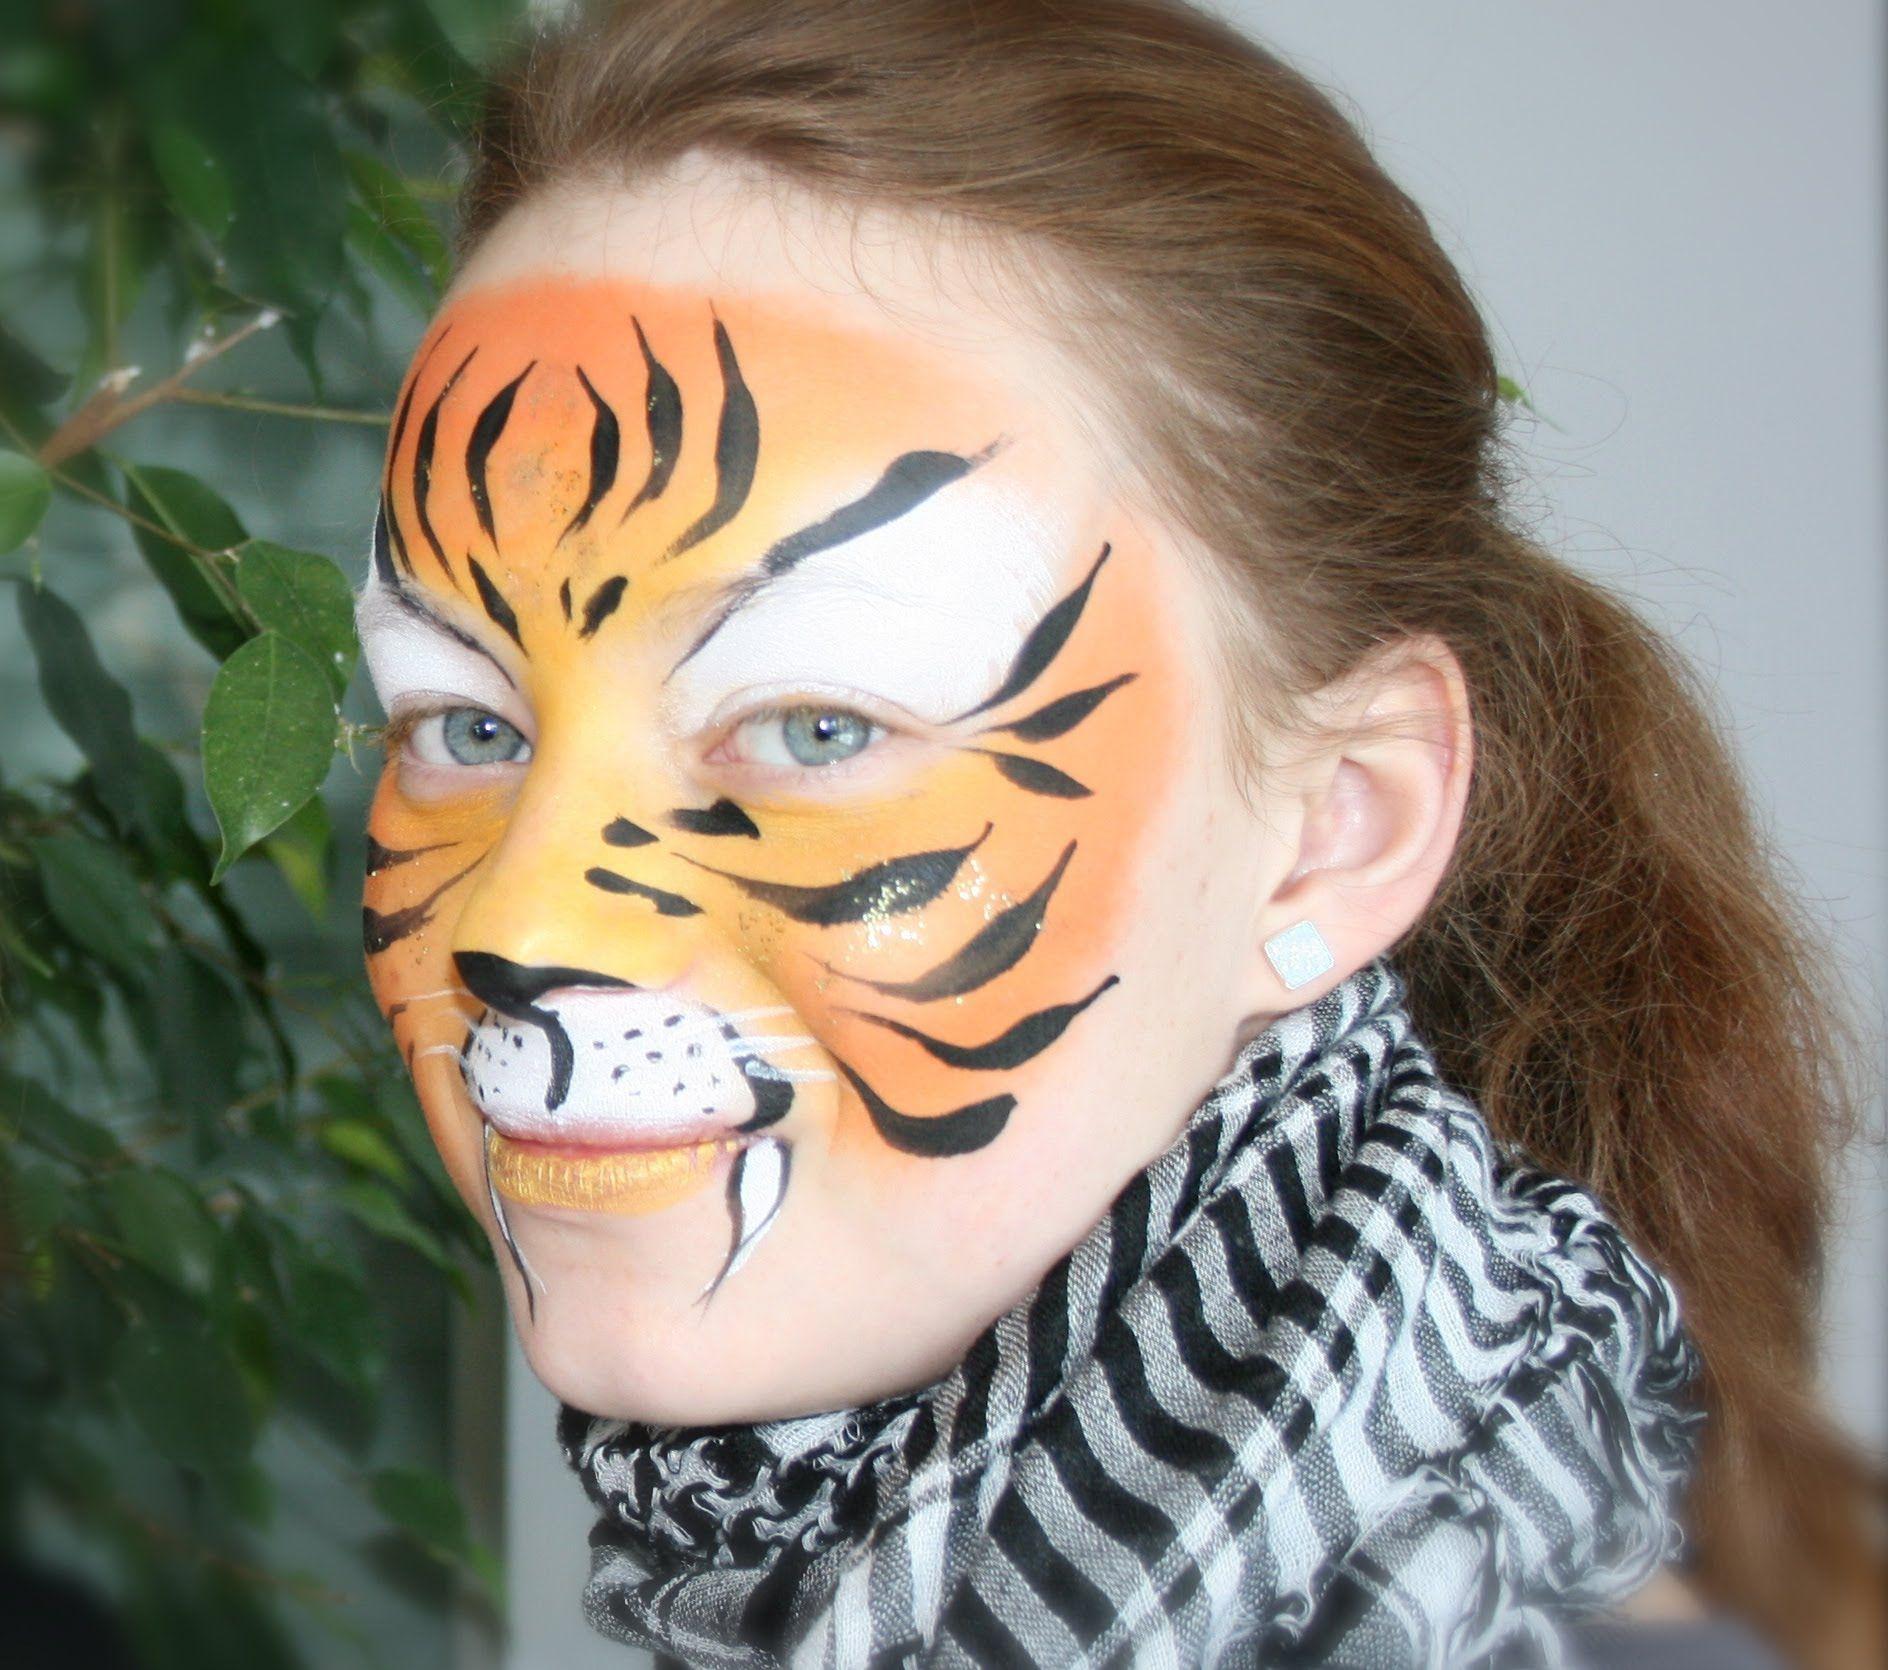 tiger schminken einfache tiger kinderschminken anleitung diy schminken face painting. Black Bedroom Furniture Sets. Home Design Ideas